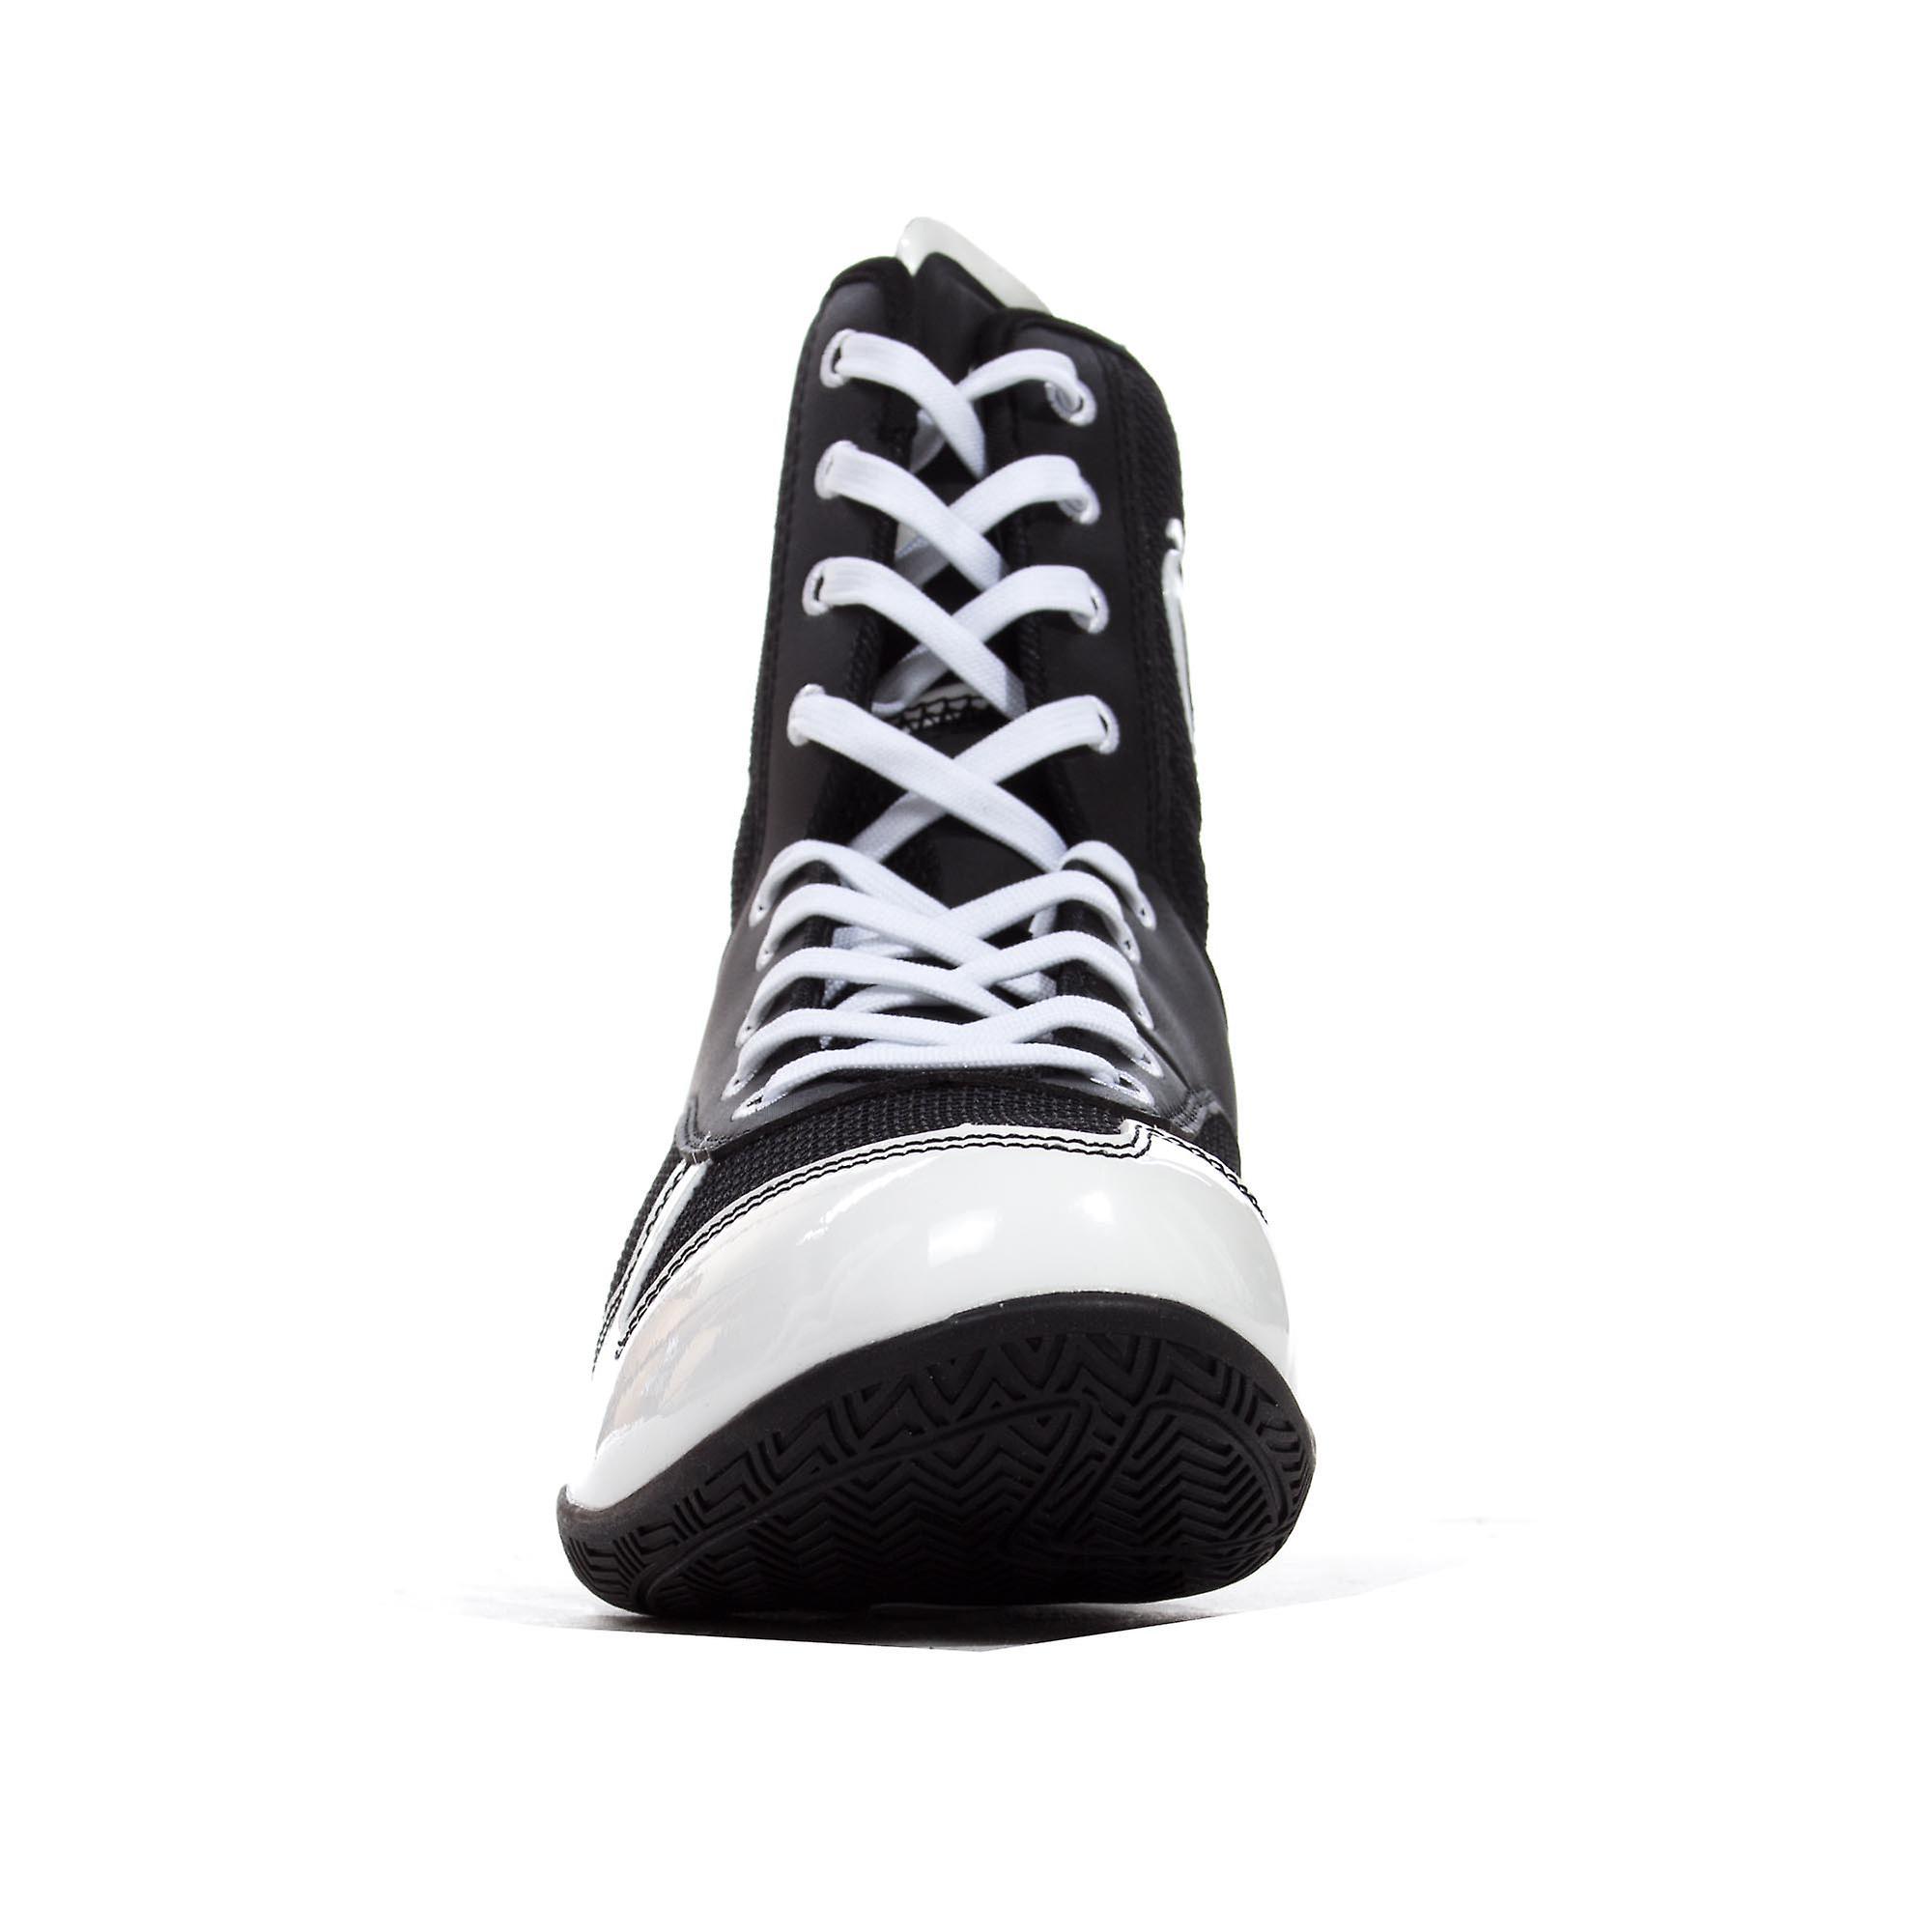 Venum Elite Mens Fitness Training MMA Boxing Boot Shoe Black/White